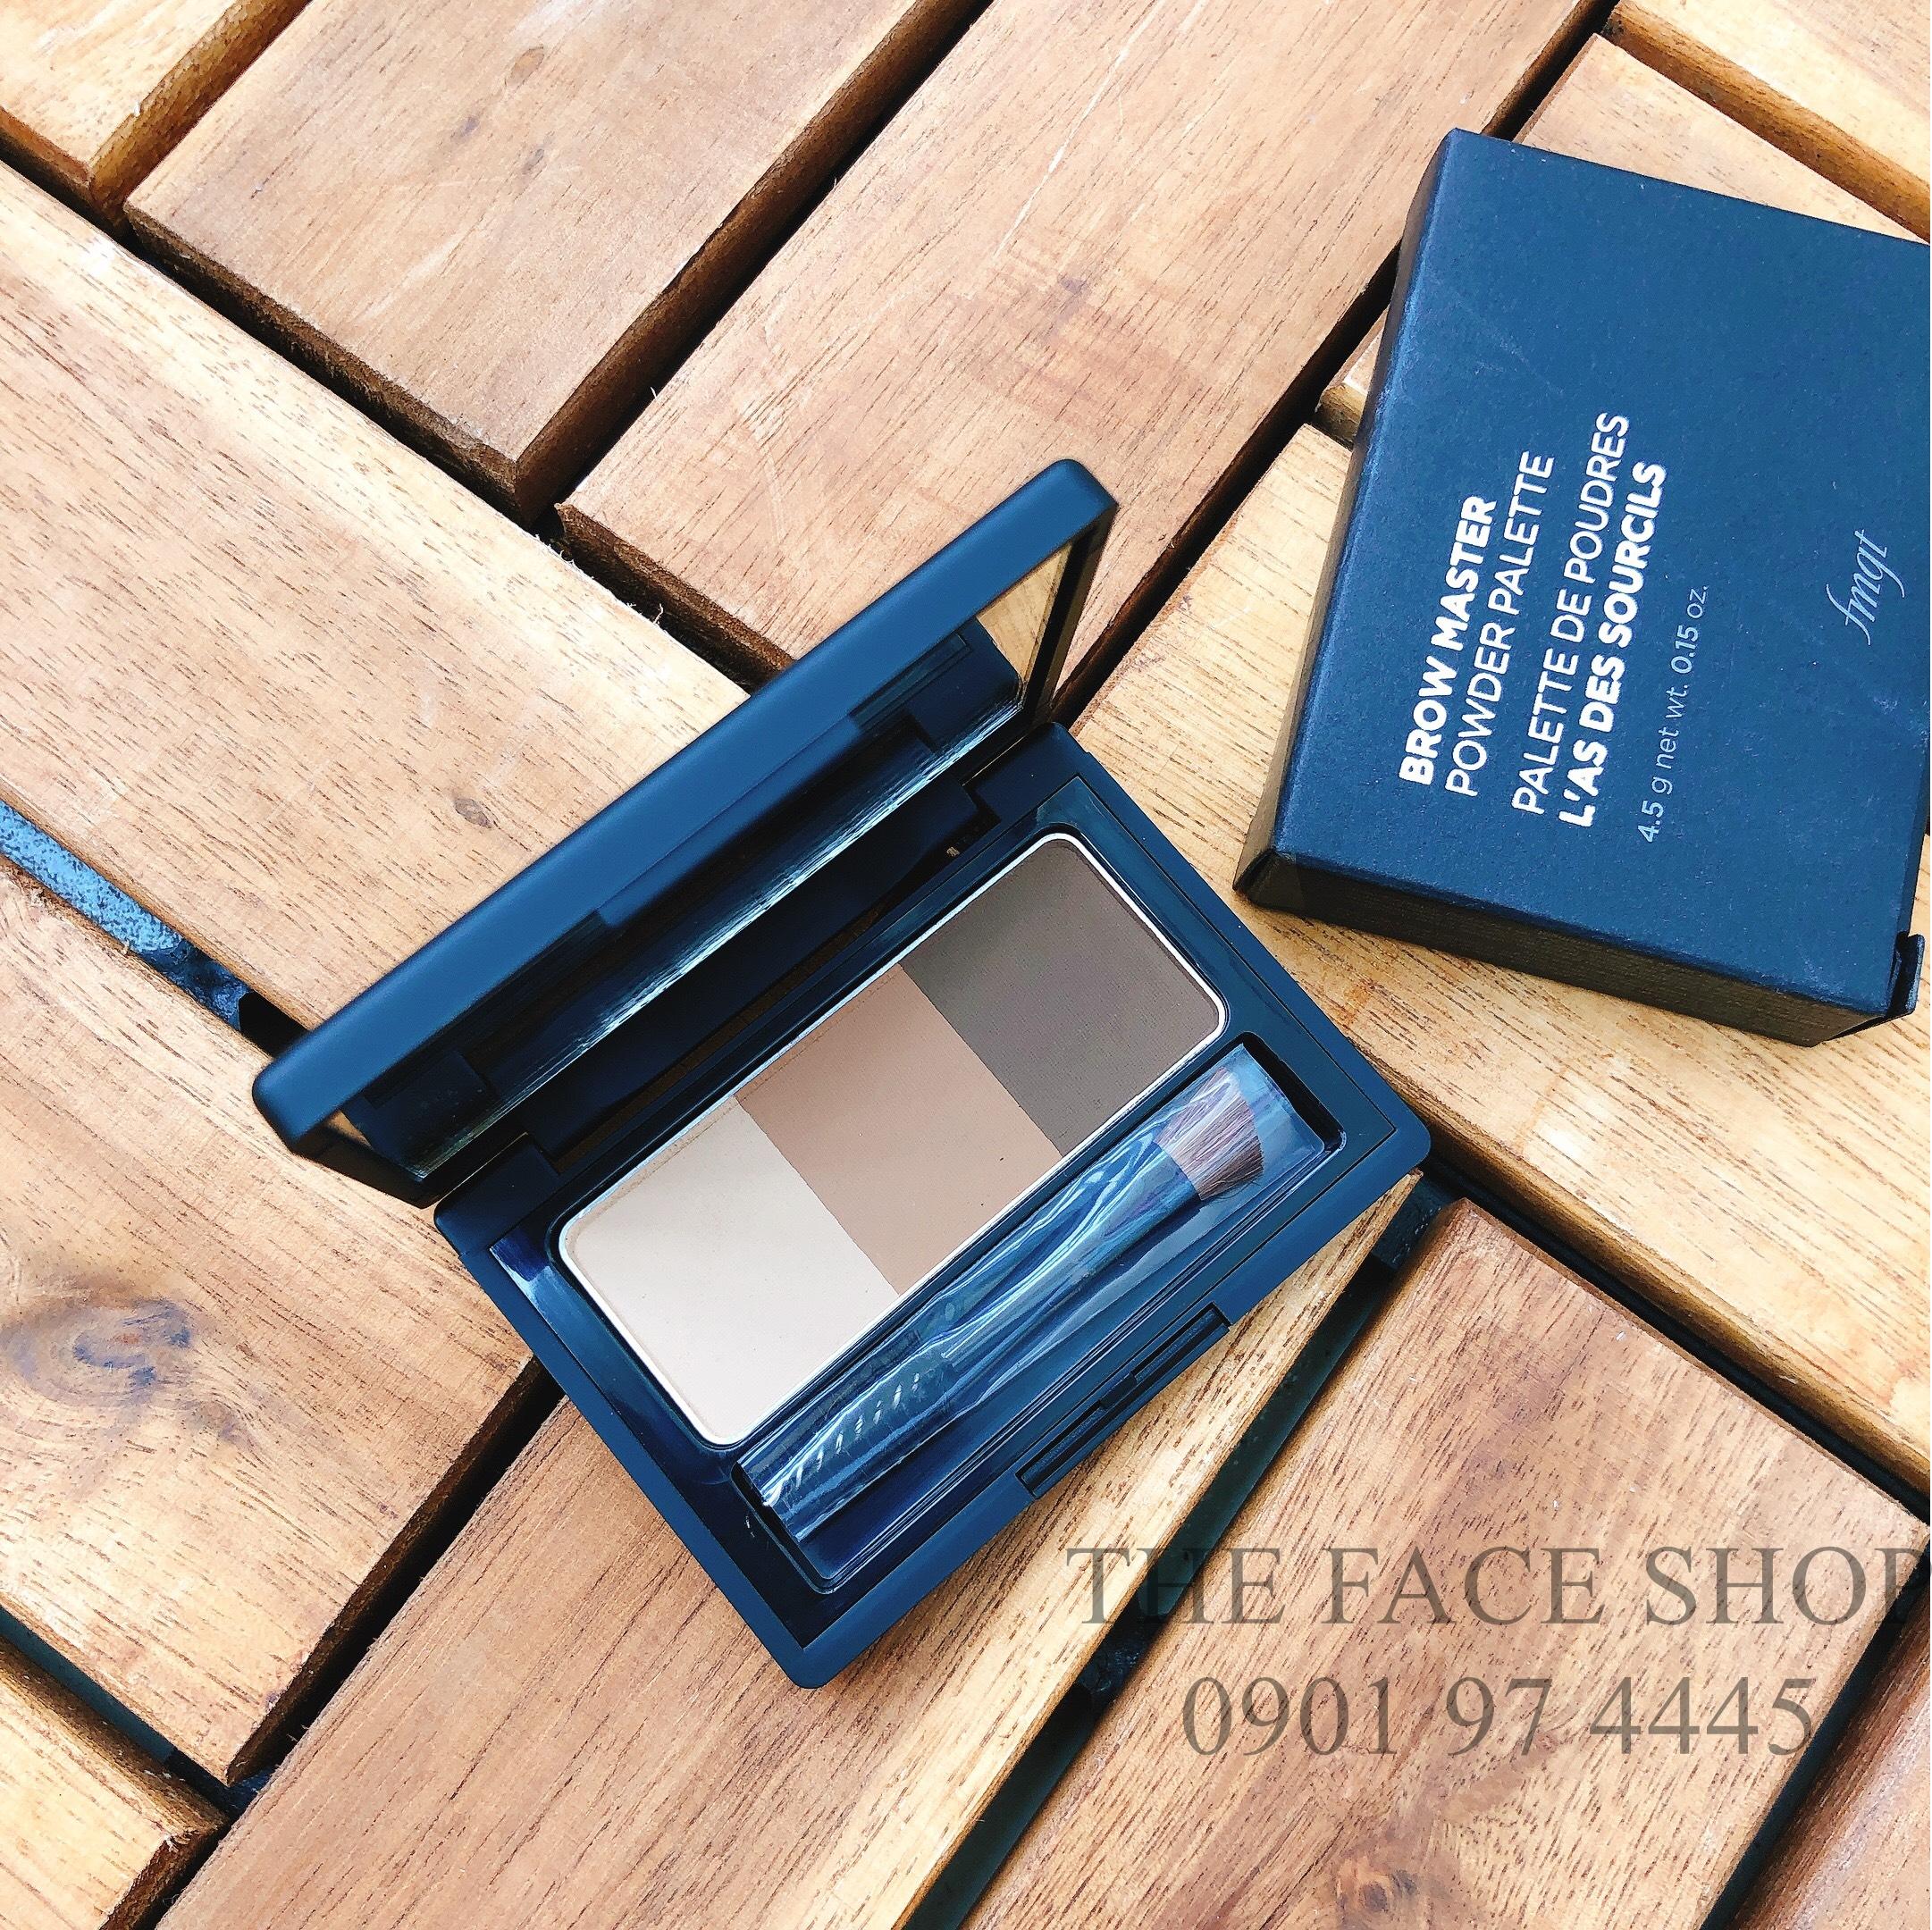 Bột kẻ chân mày Brow Master Power Palette #01 Beige Brown The Face Shop